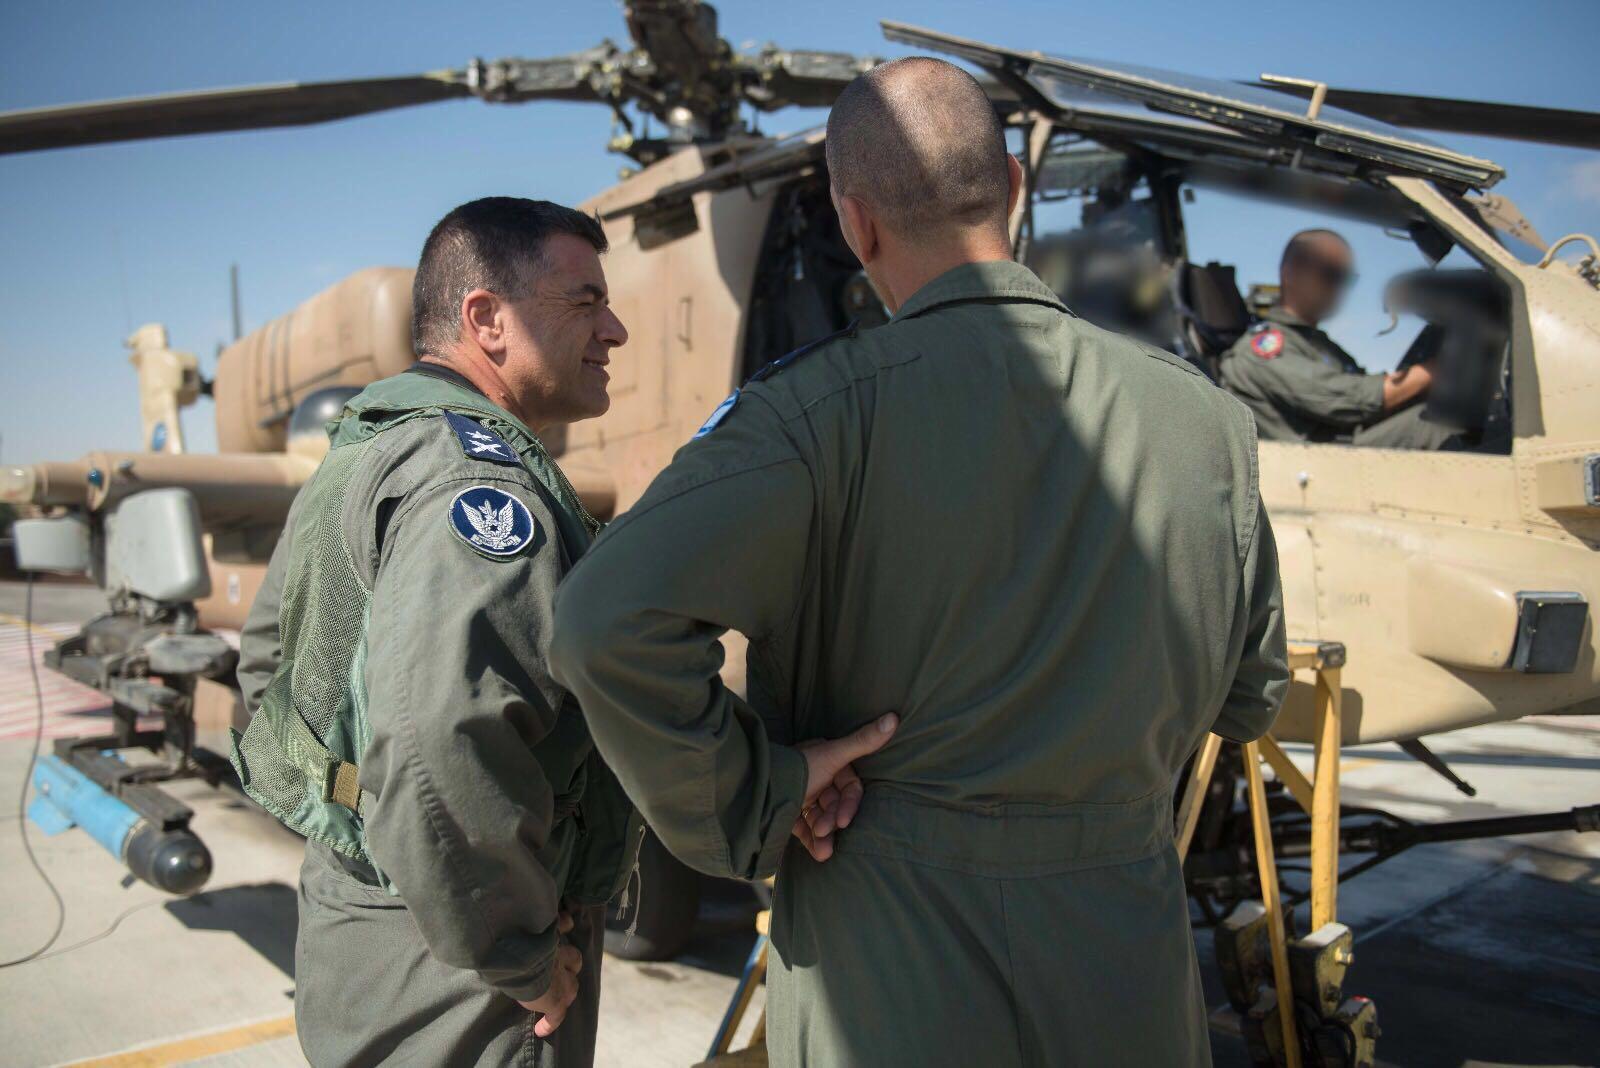 Israeli Air Force Chief Maj Gen Amikam Norkin Takes Part In A Training Flight